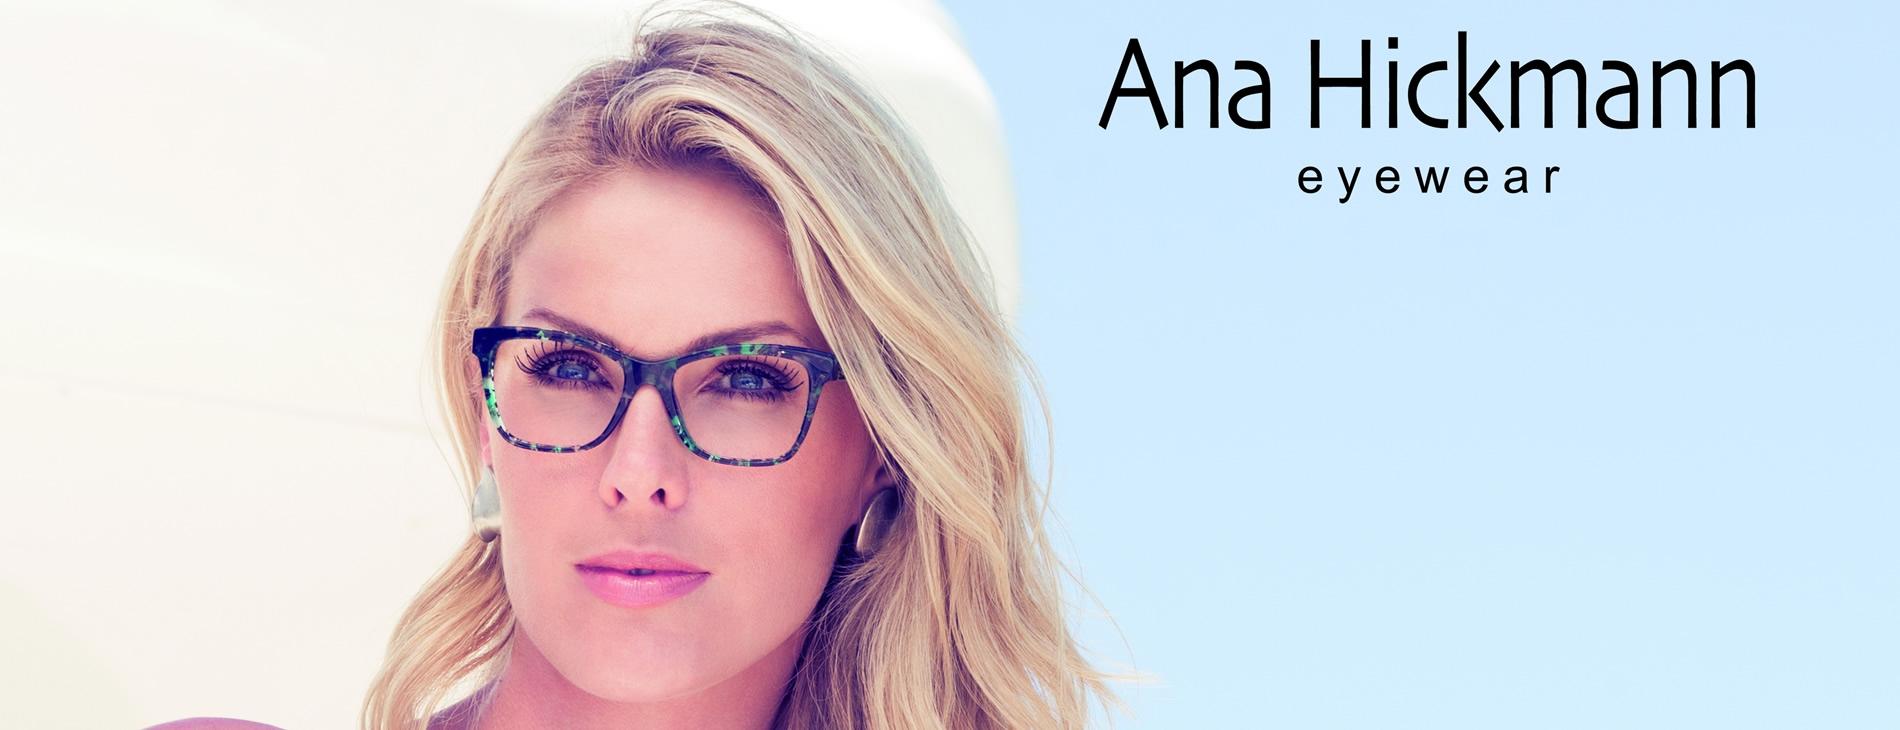 http://oticasbrilhodosol.com.br/oculos-de-sol/oculos-de-sol-feminino.html